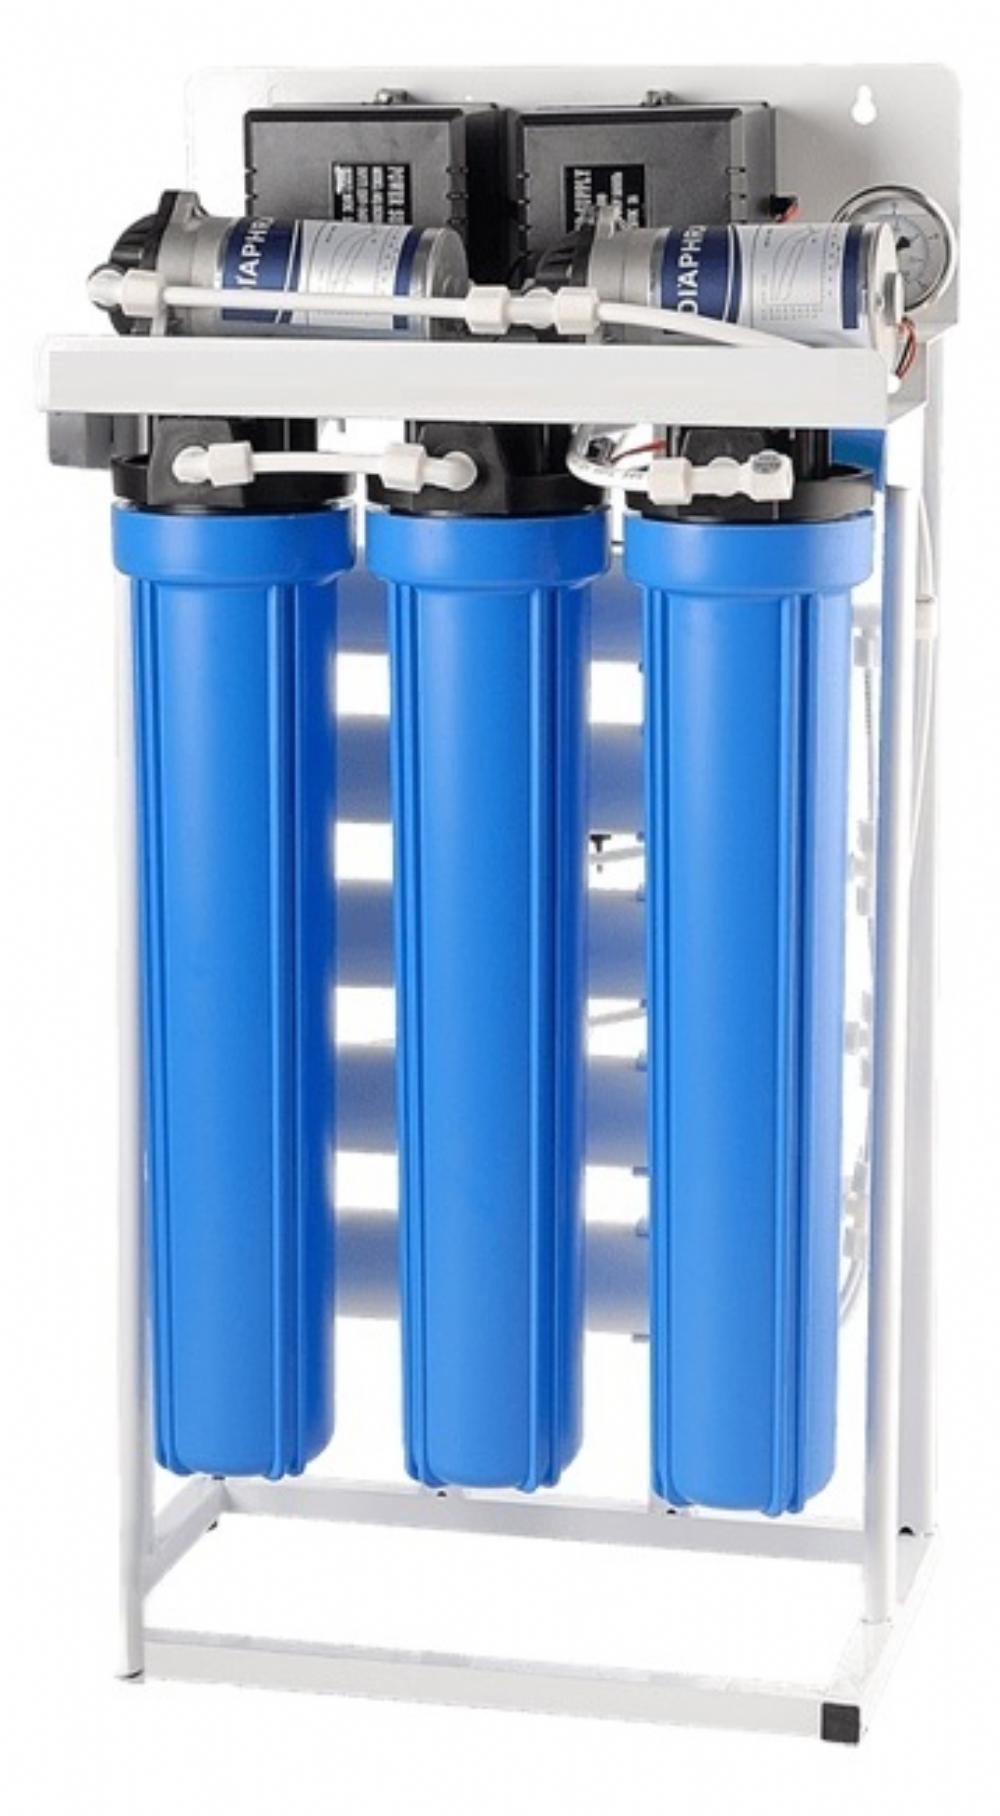 Ro-200 WP Pompalı Tezgahaltı Ters Ozmoz Sistemi 6 Aşamalı